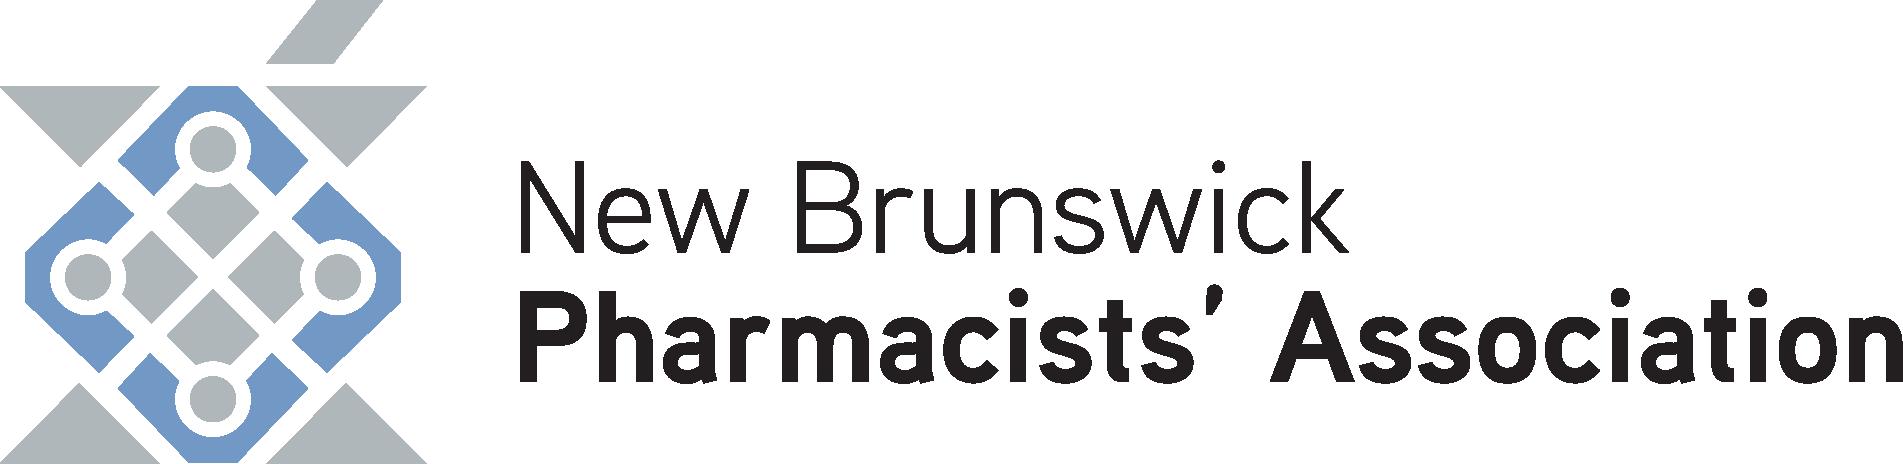 New brunswick pharmacists association publicscrutiny Images